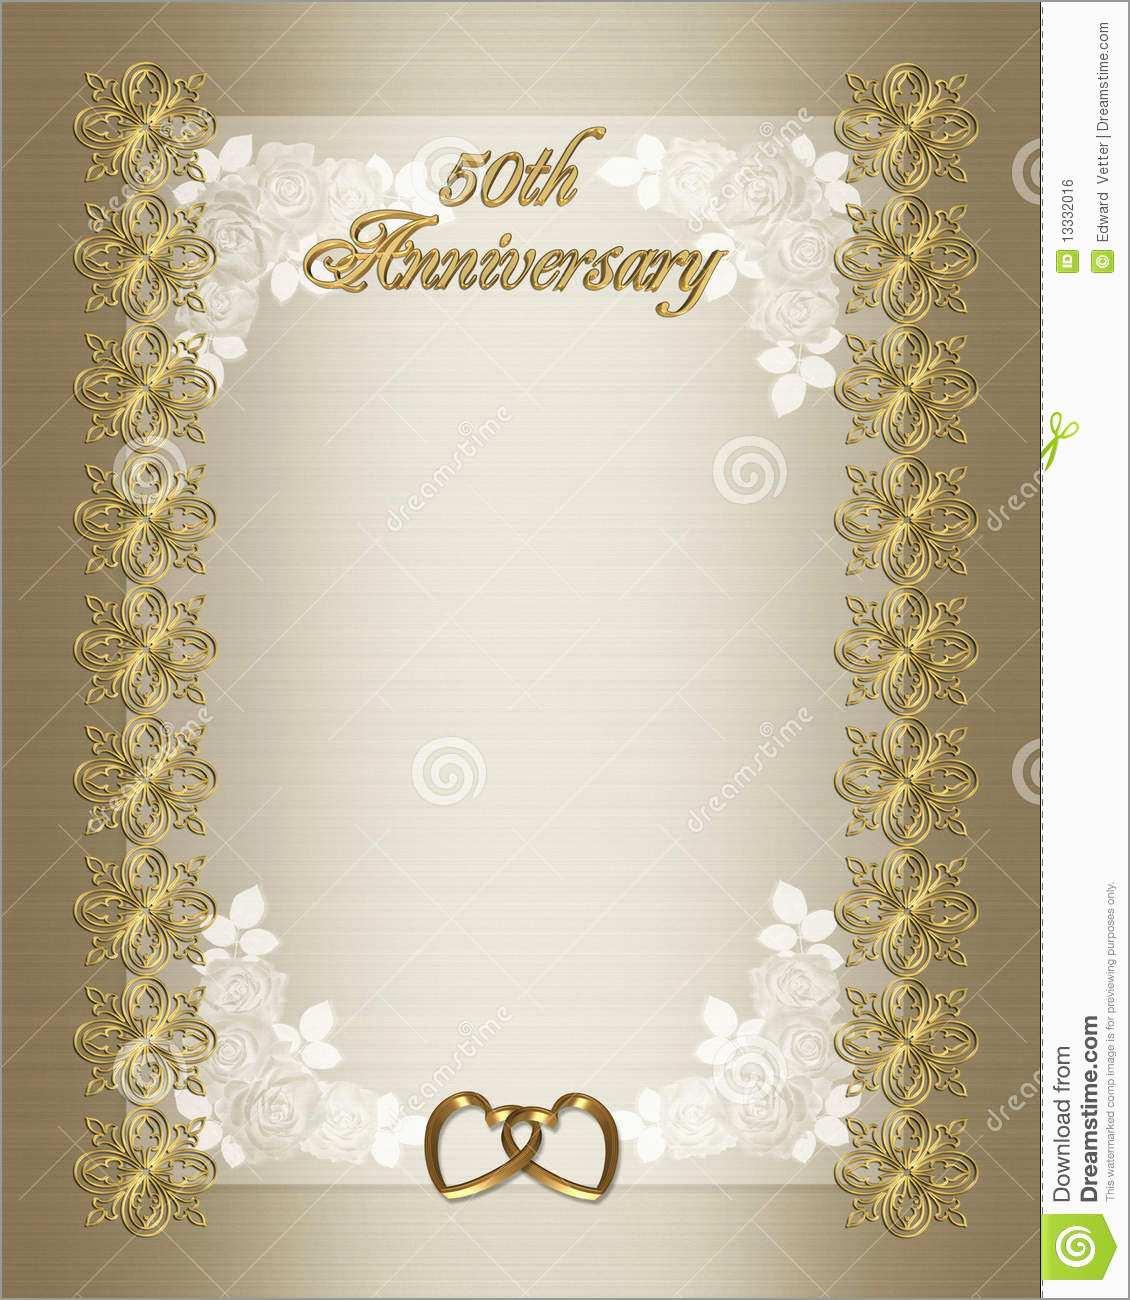 50th Wedding Anniversary Invitations Templates Free Download Marvelous 50th Wedding Anniversary Invitation Template Stock